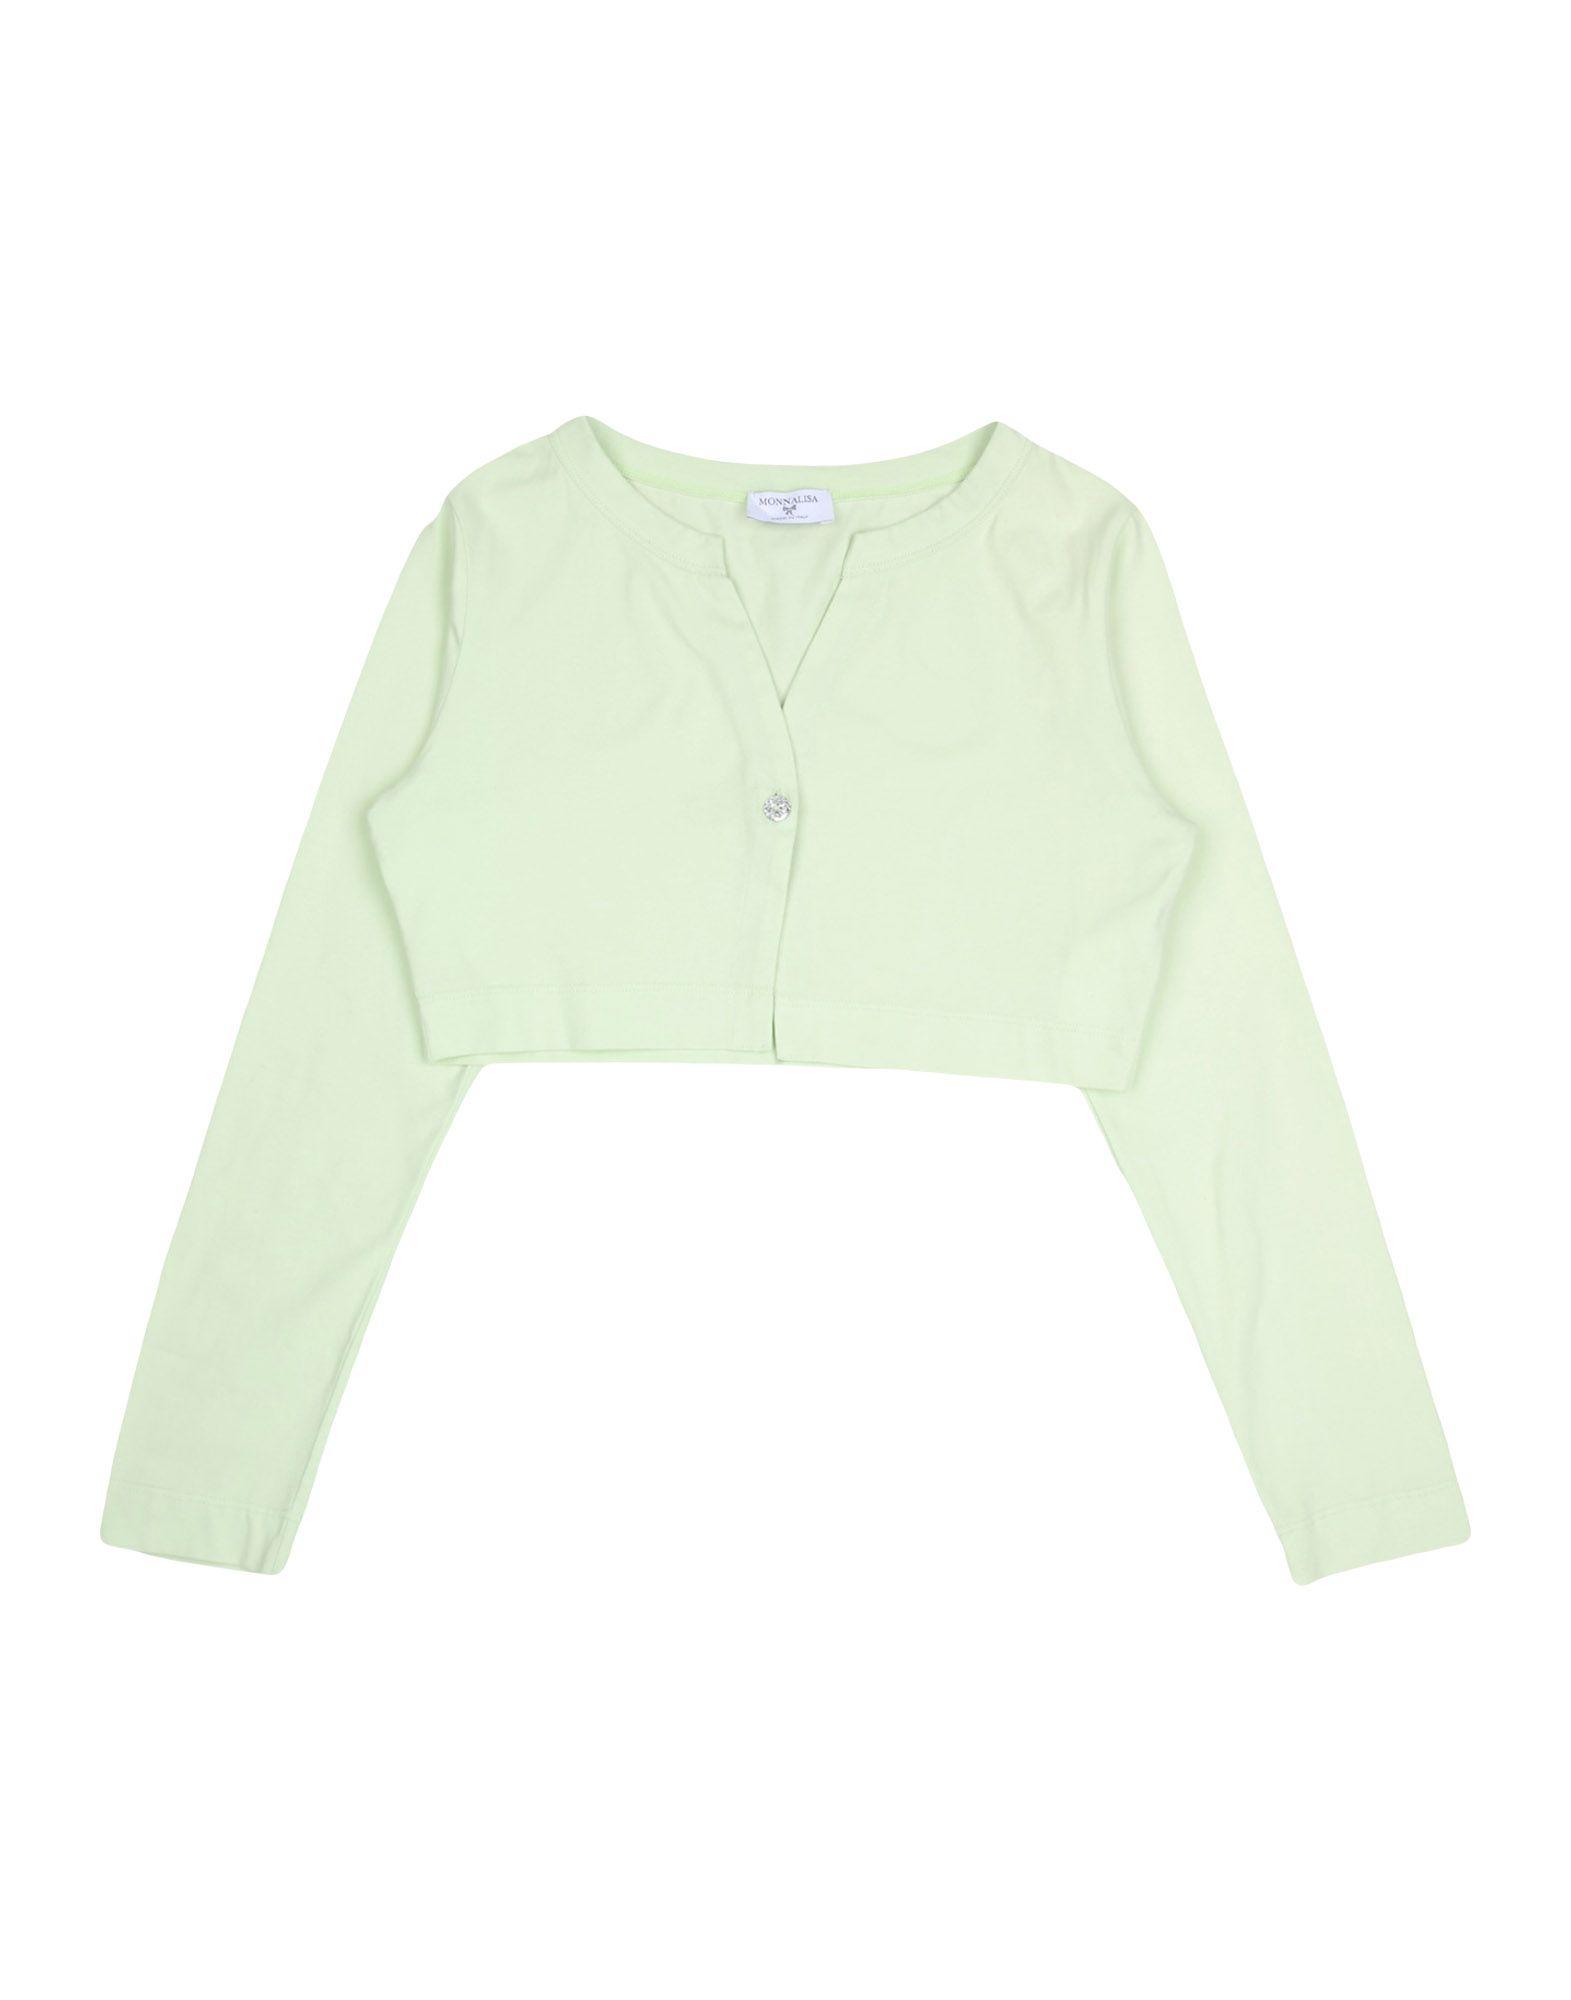 MONNALISA Cardigan in Light Green